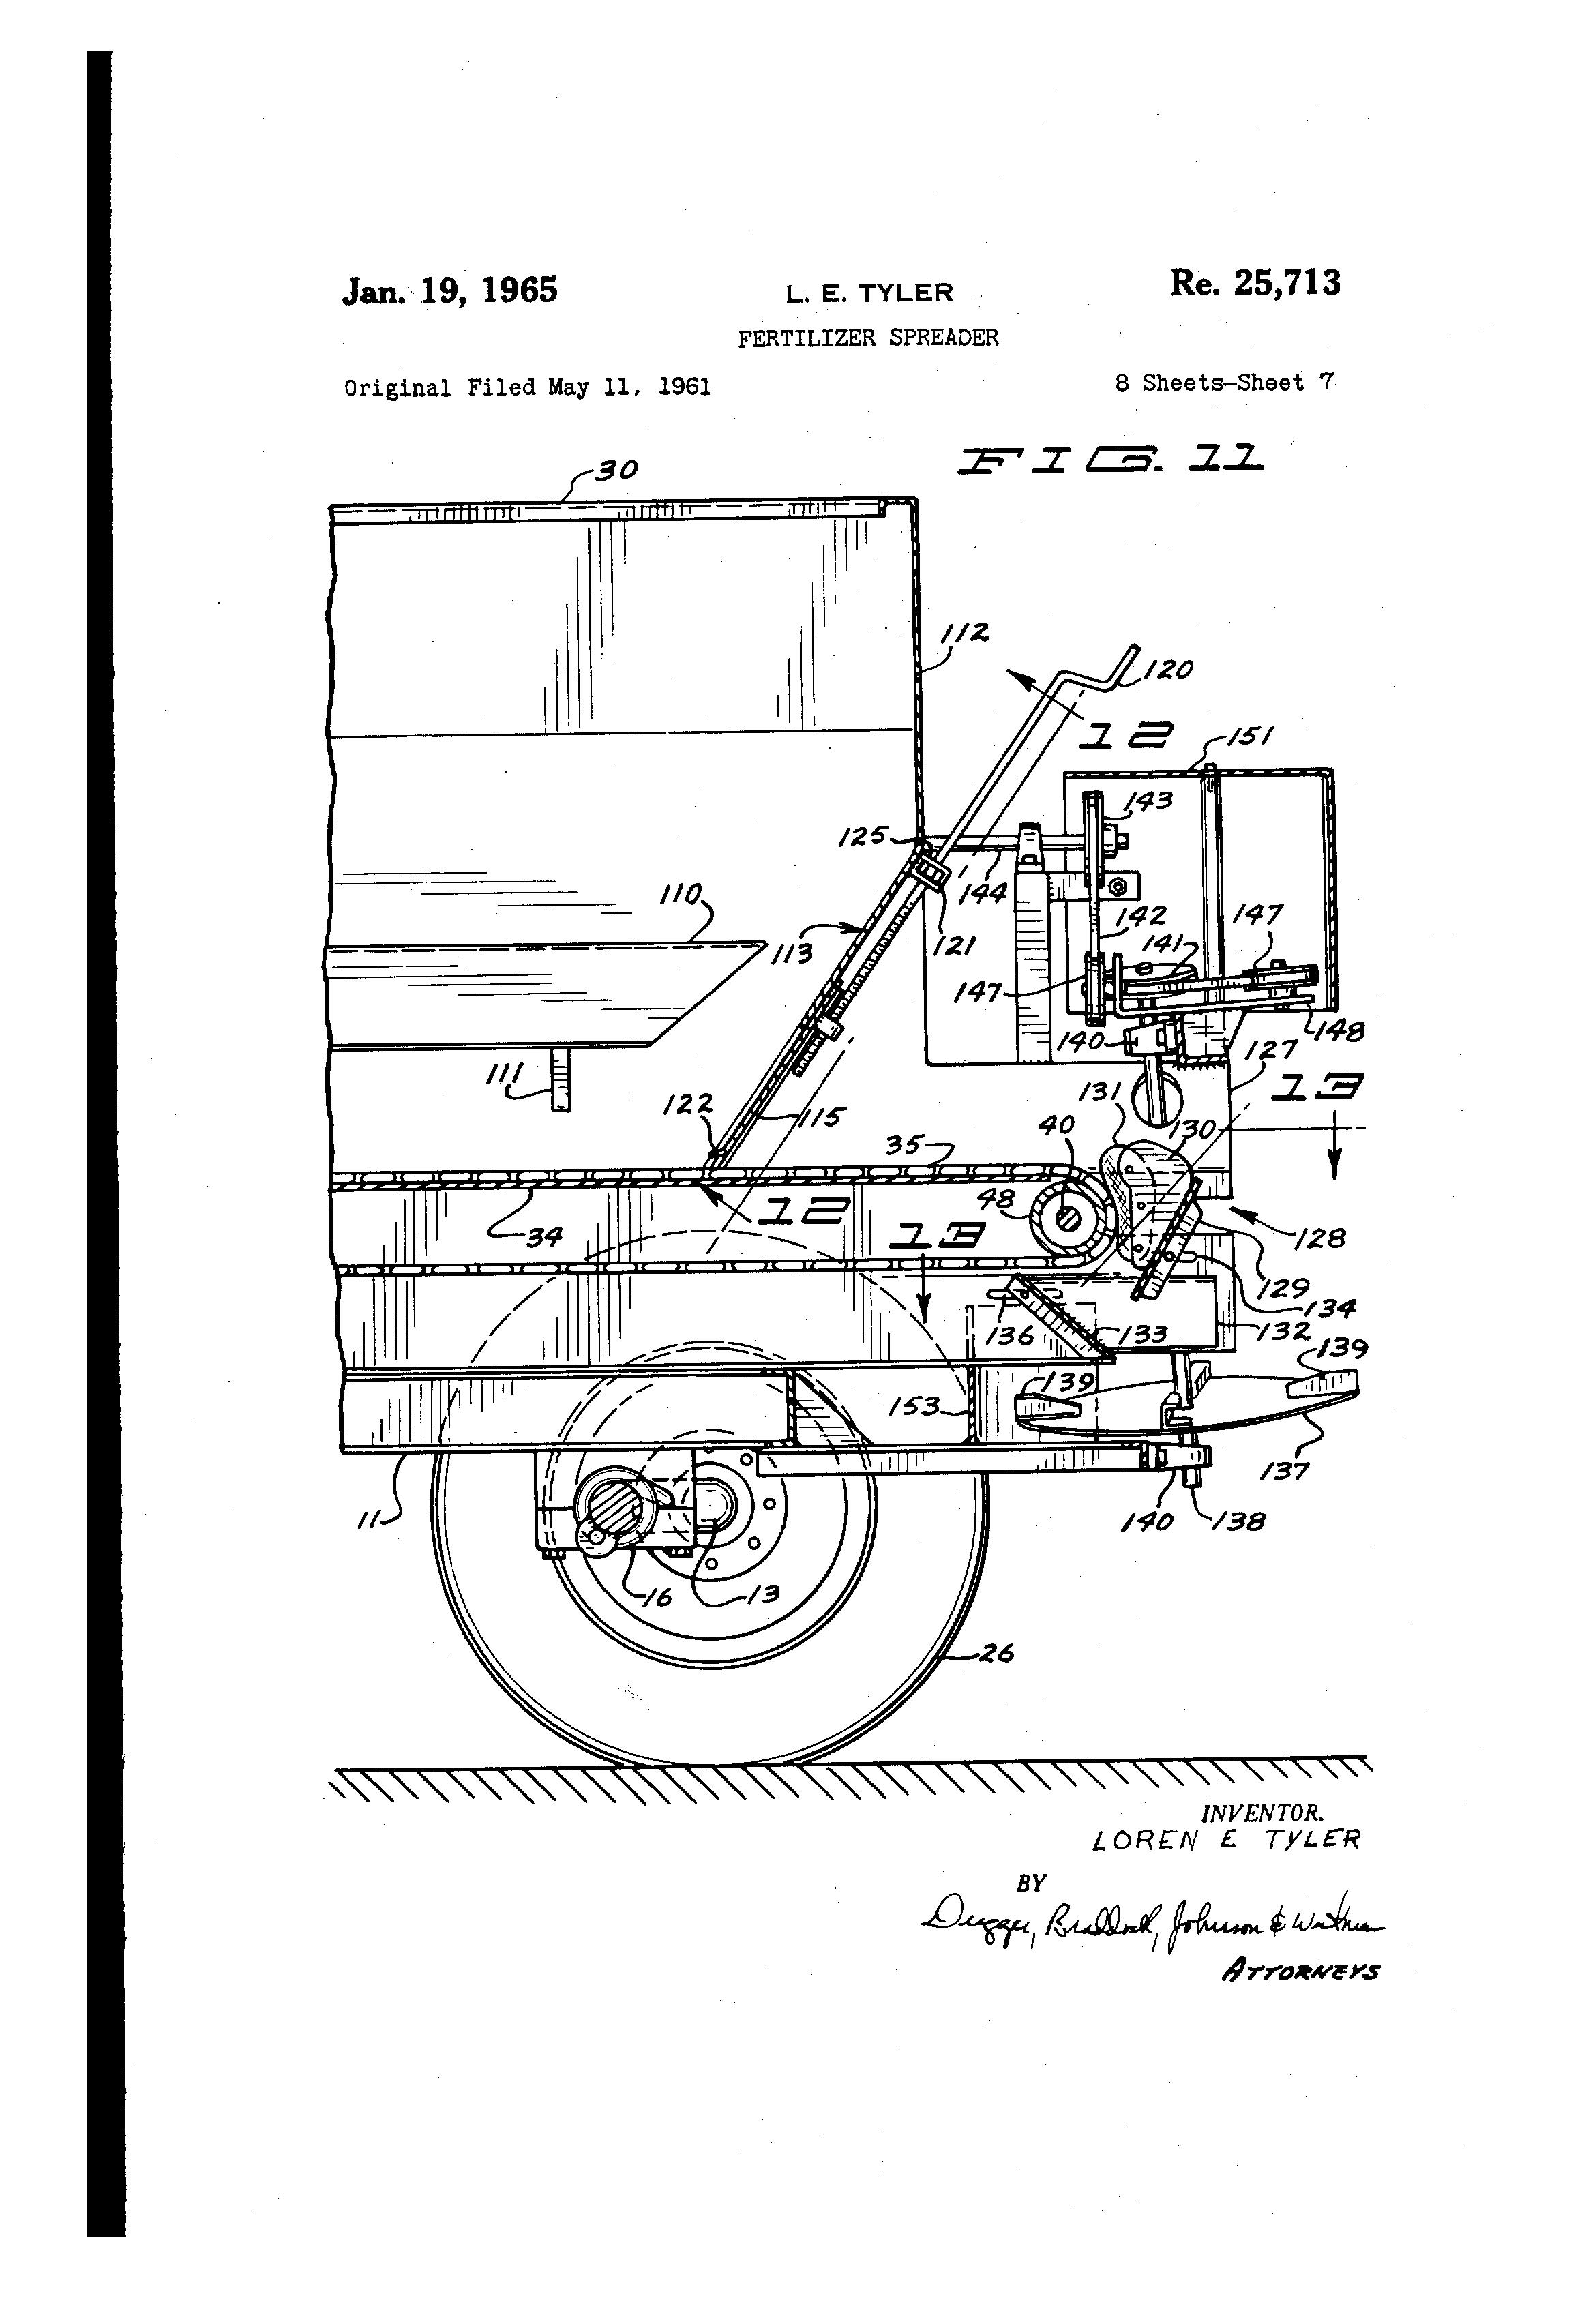 tyler fertilizer spreader parts manual